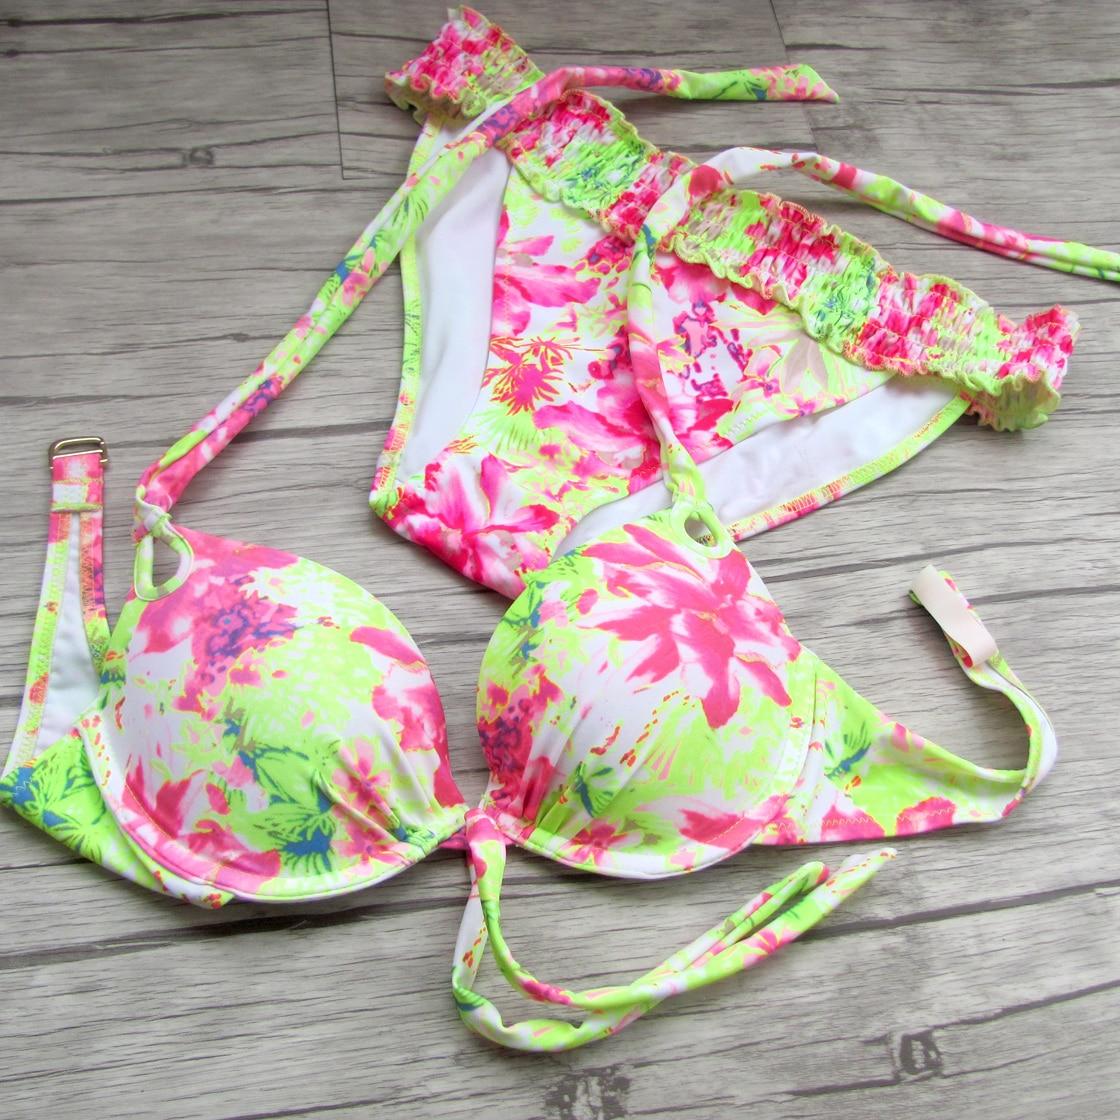 2017 Sexy bathing suits women bikinis Printing yellow Sexystrapless maillot de bain bikini women swimwear Design Secret<br><br>Aliexpress